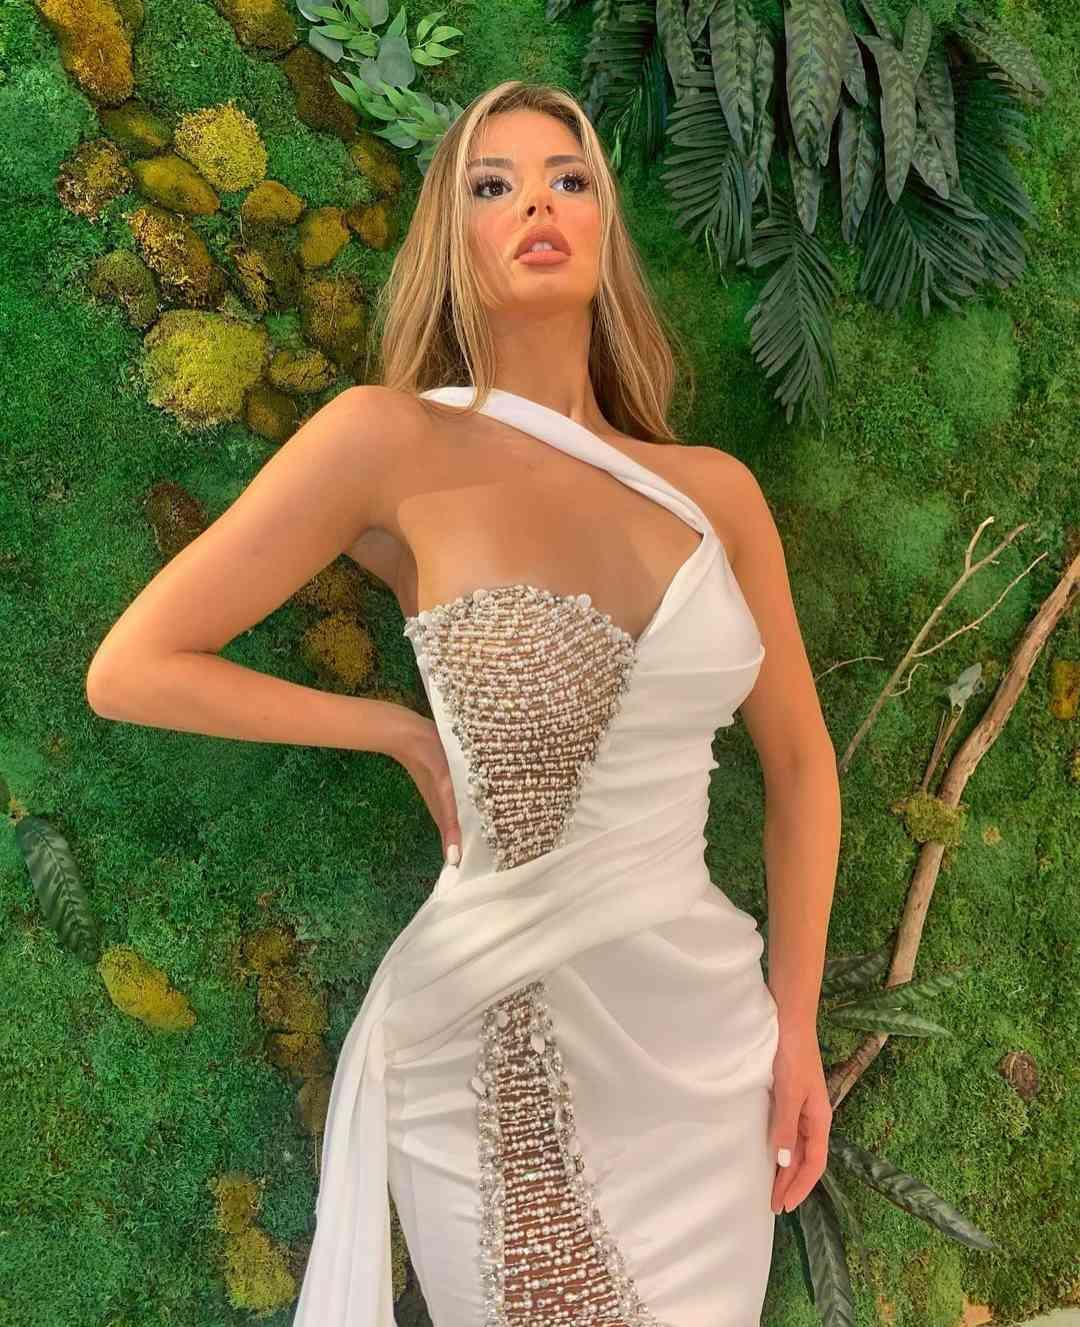 Elegant Mermaid Evening Dresses 2020 Side Slit Beading Long Prom Gowns Plus Size Saitn Red Carpet Dress